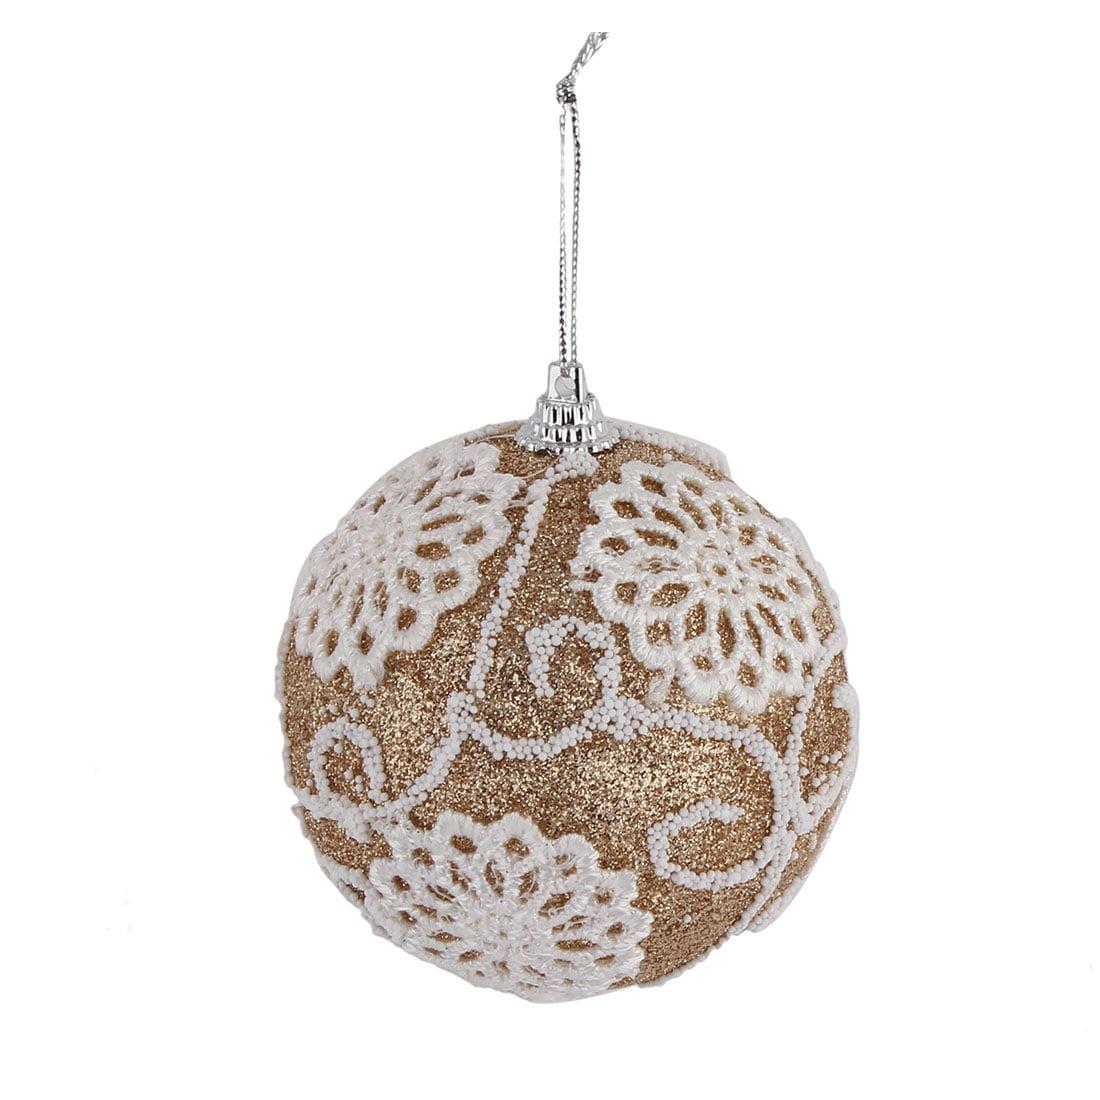 Unique Bargains Home Christmas Tree Applique Decor Artificial Collectible Festive Hanging Ball